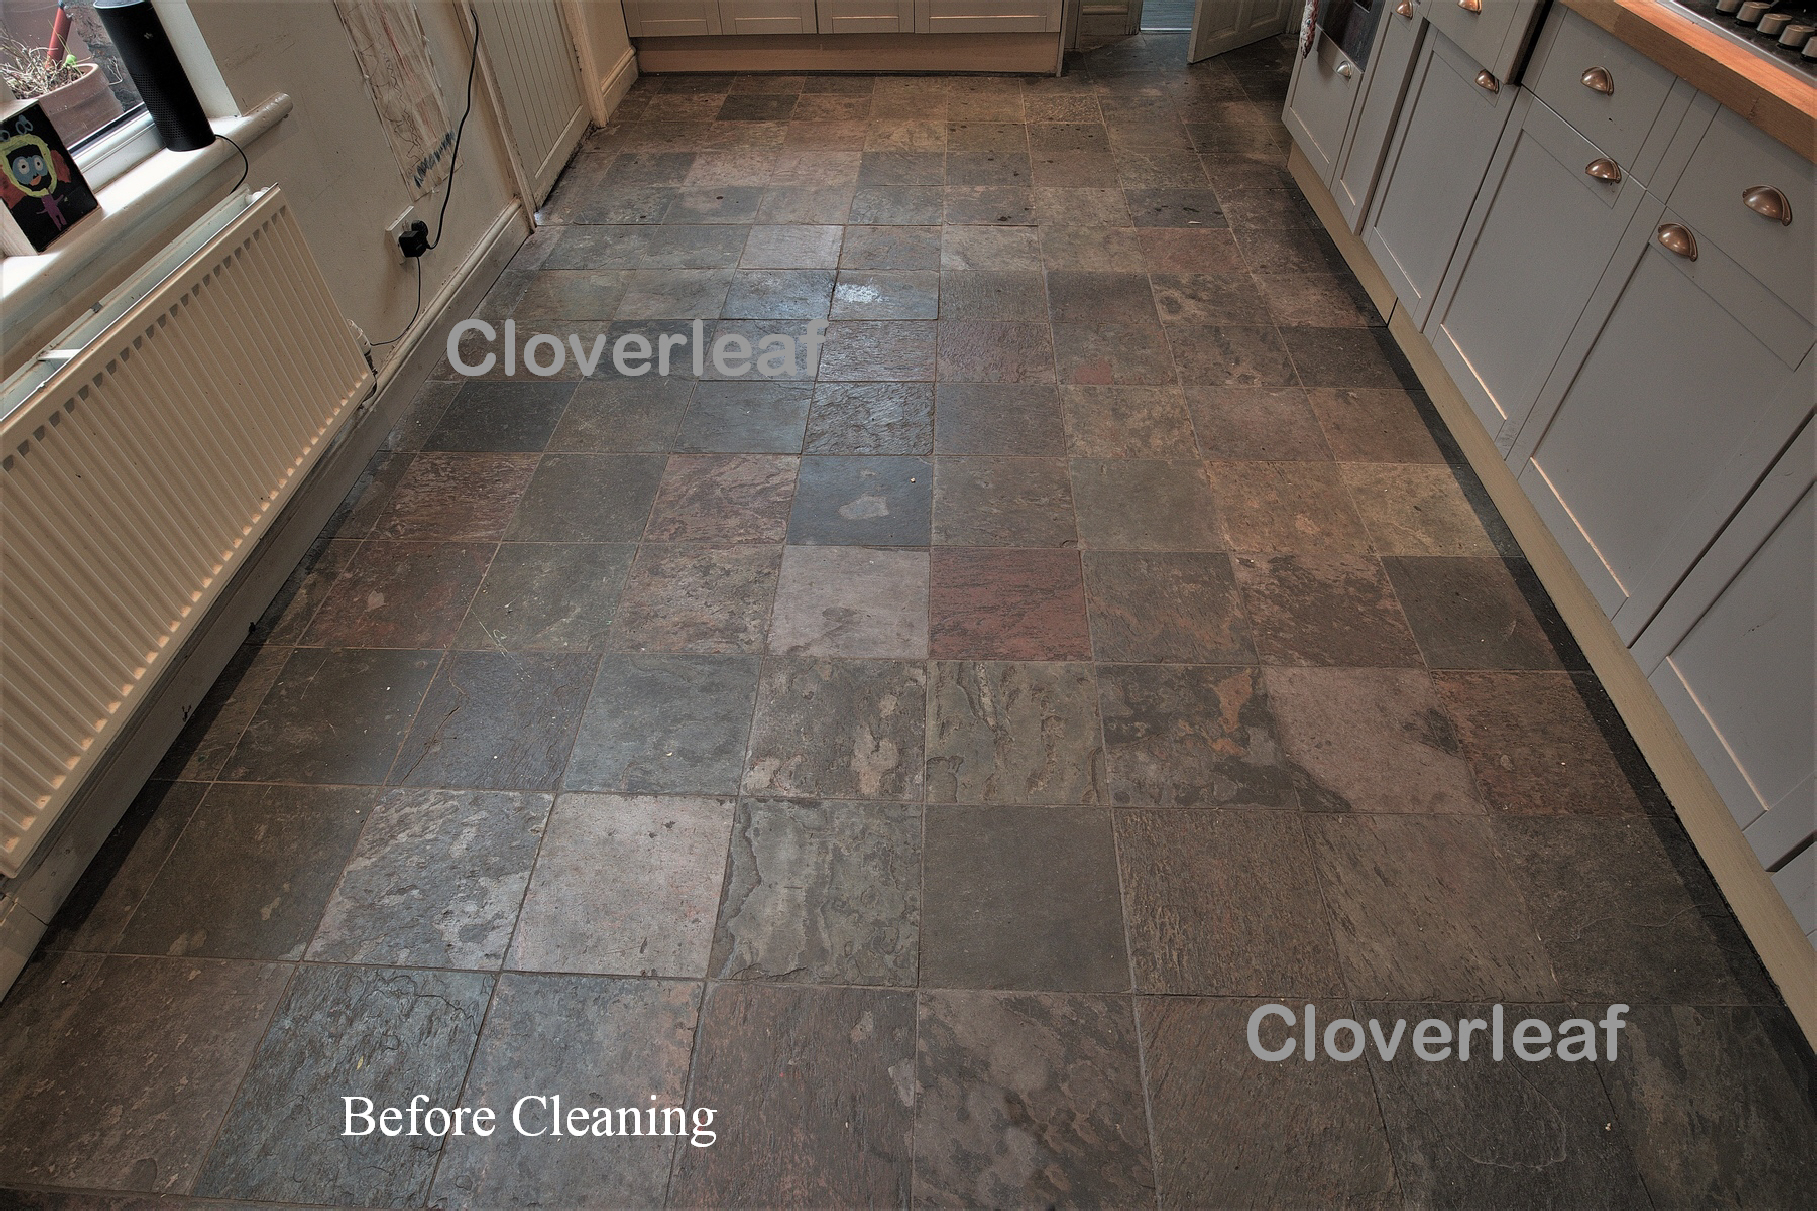 Slkate floor cleaning Macclesfield